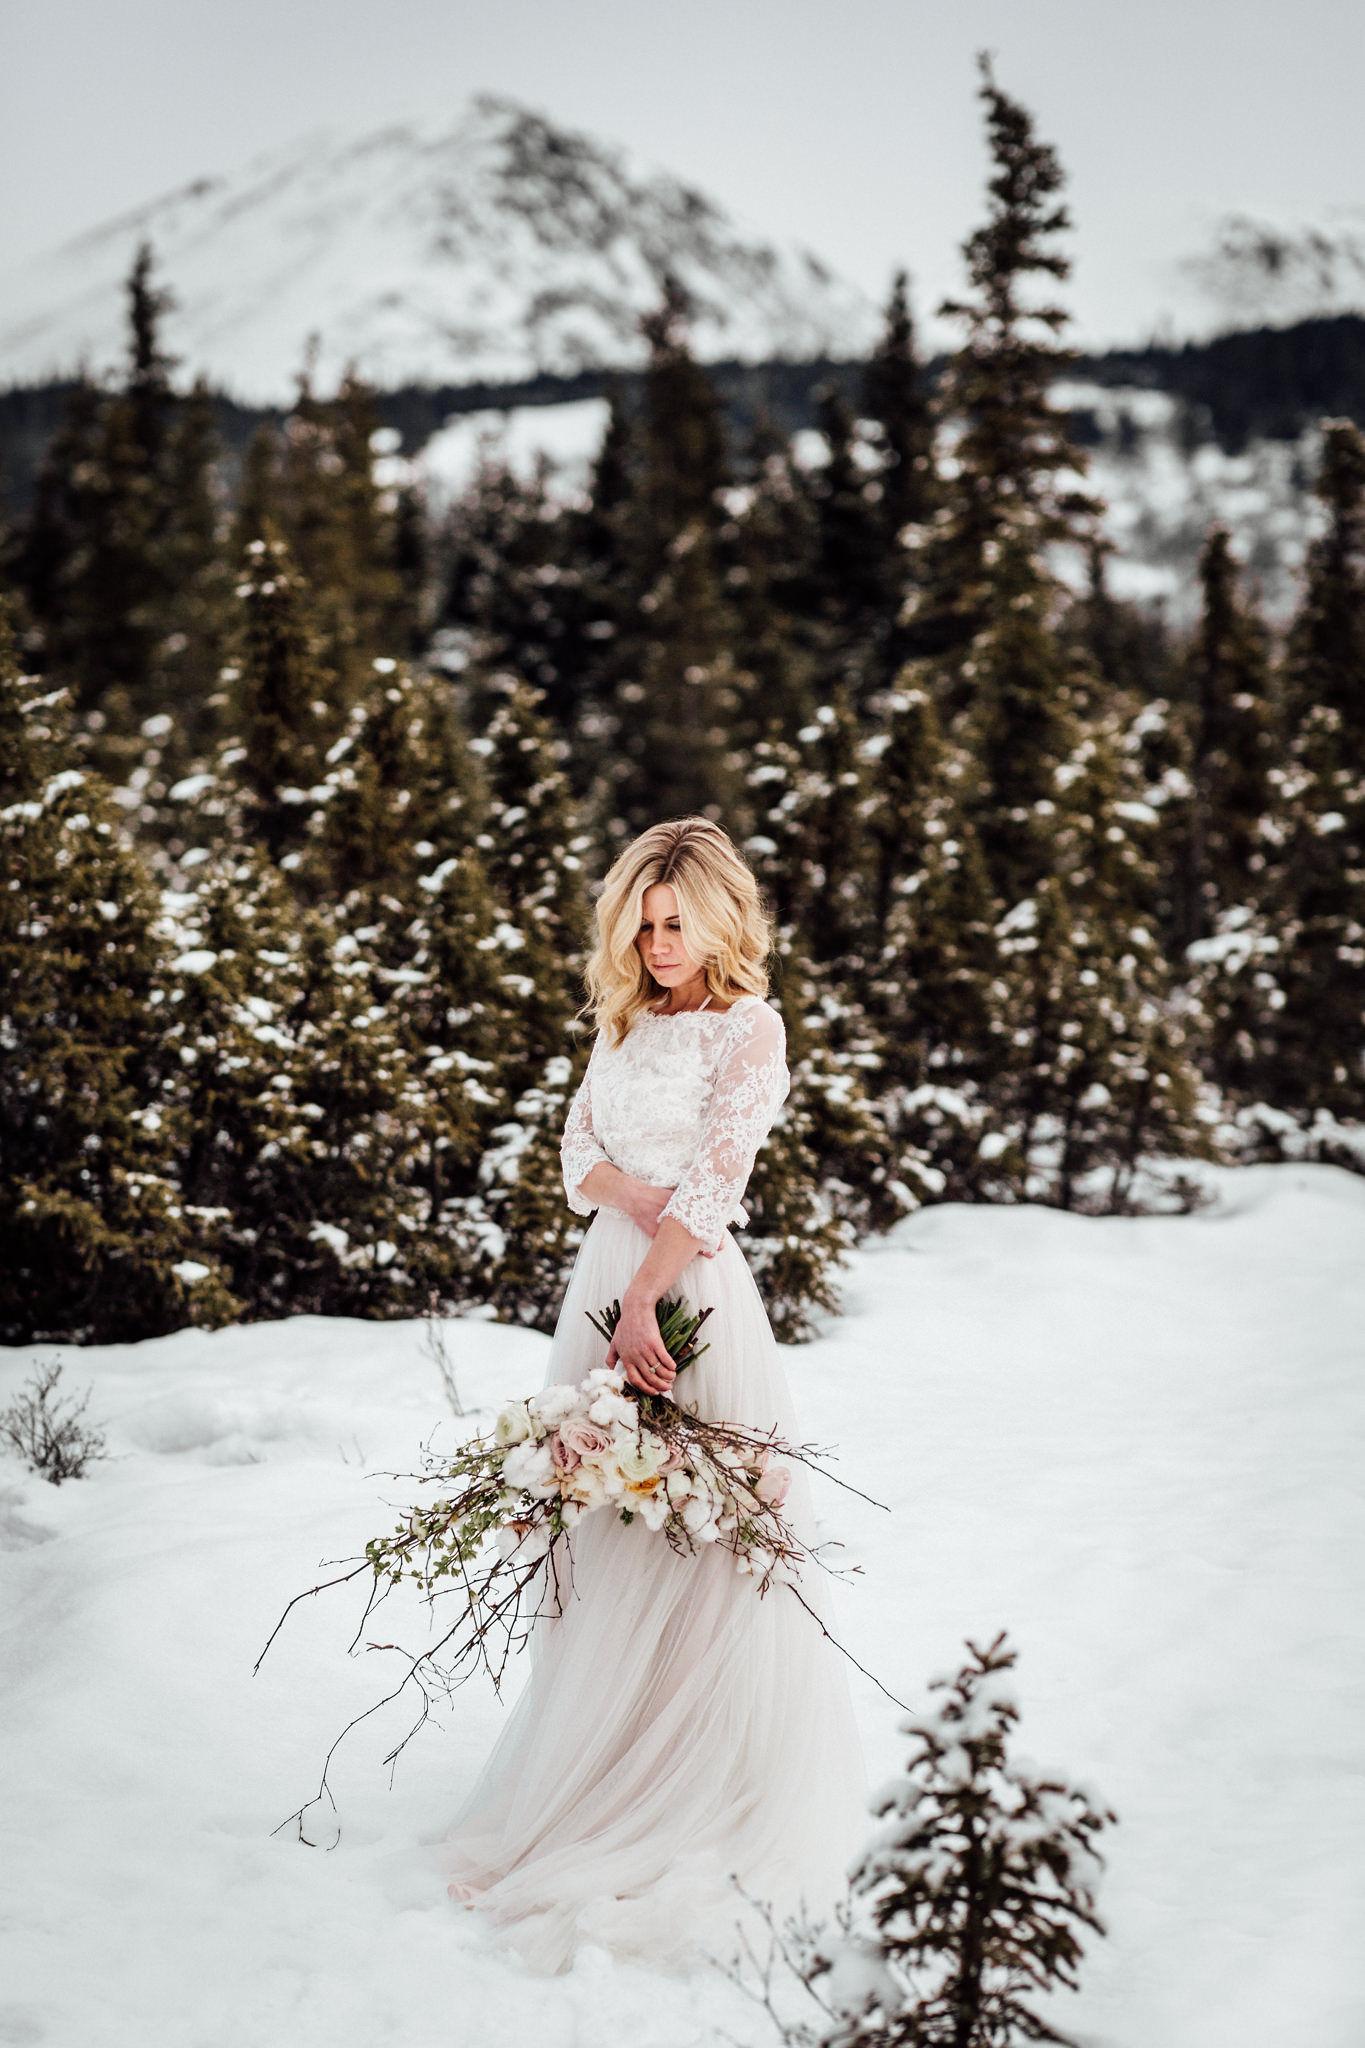 Blomma Designs - Anchorage, Alaska Wedding Design, Decor and Floral - Winter Wedding Bouquet